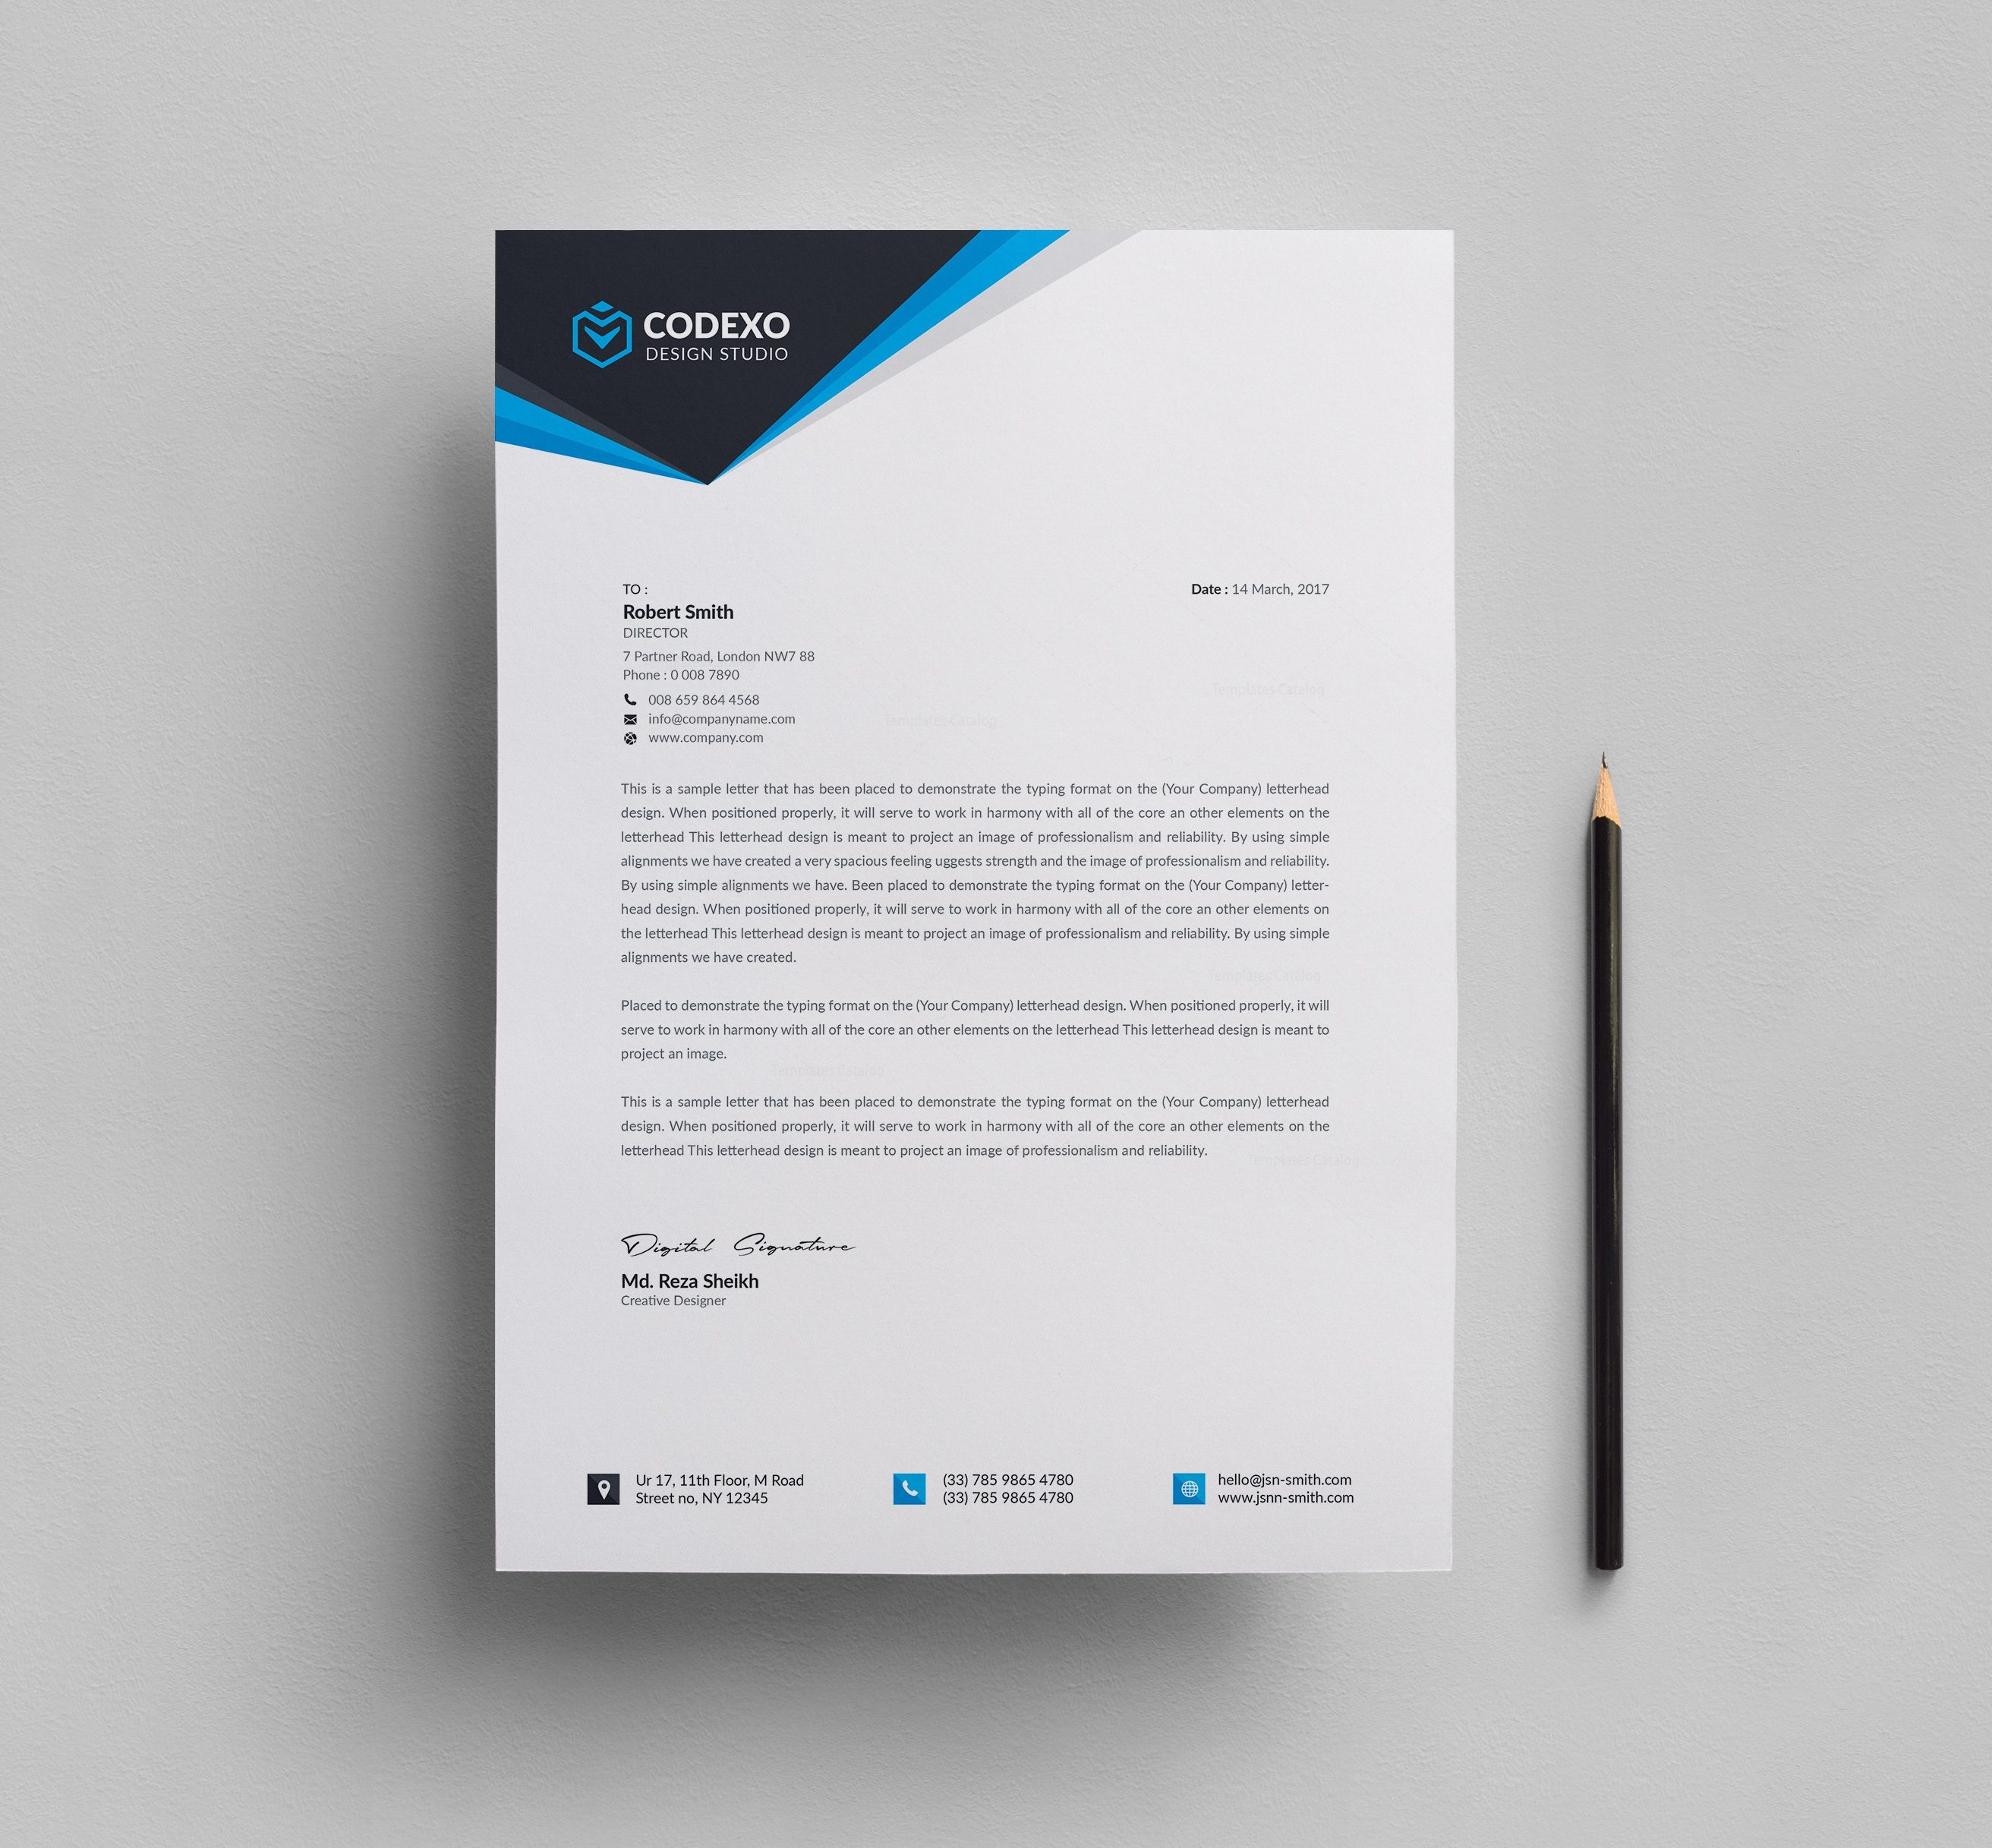 Create Free Letterhead Design: Letterhead Design Templates 000610